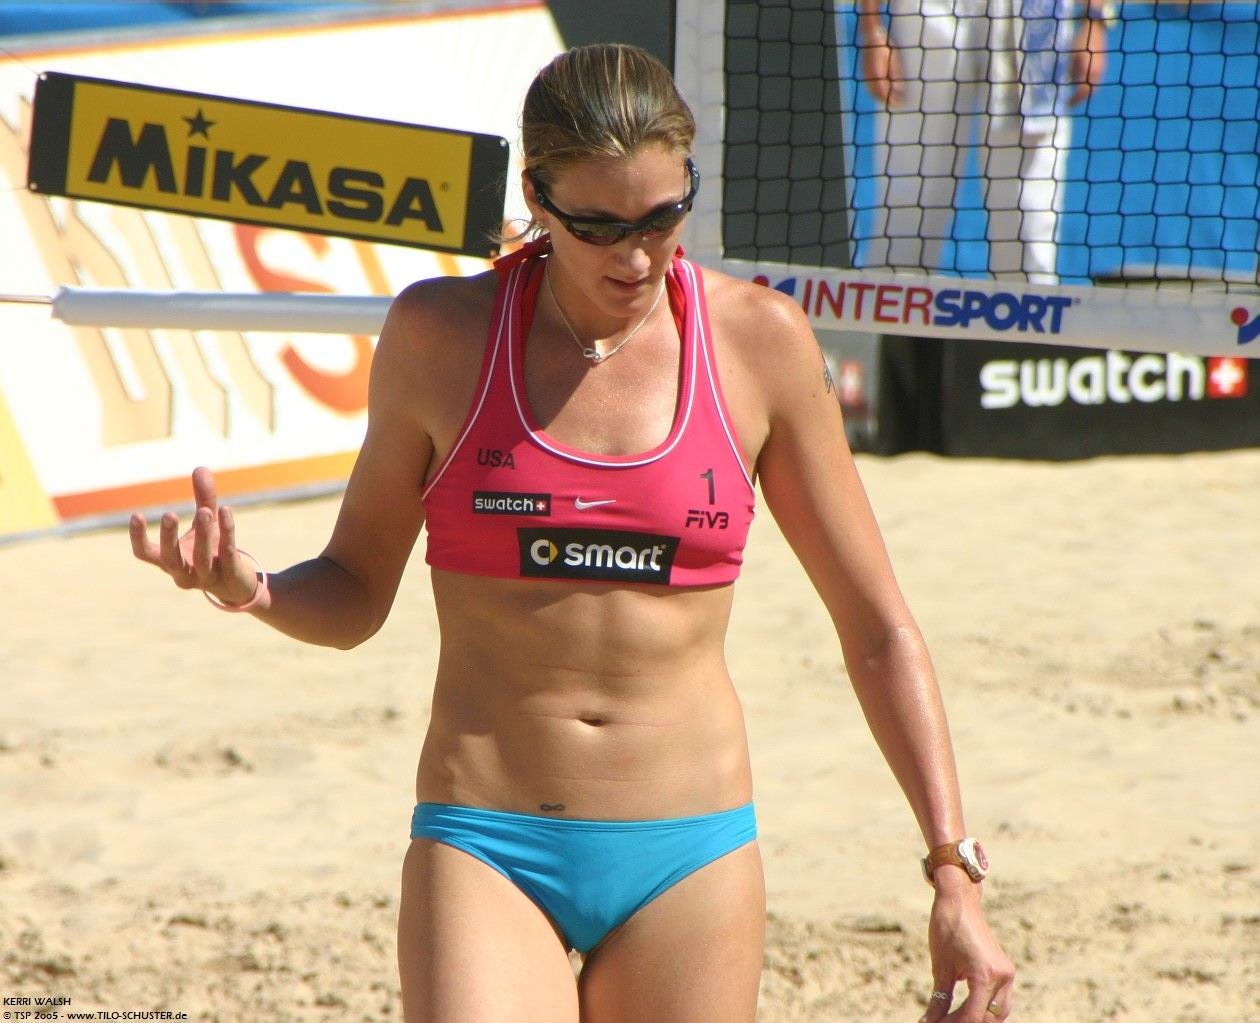 Kerri Walsh - American Beach volleyballer